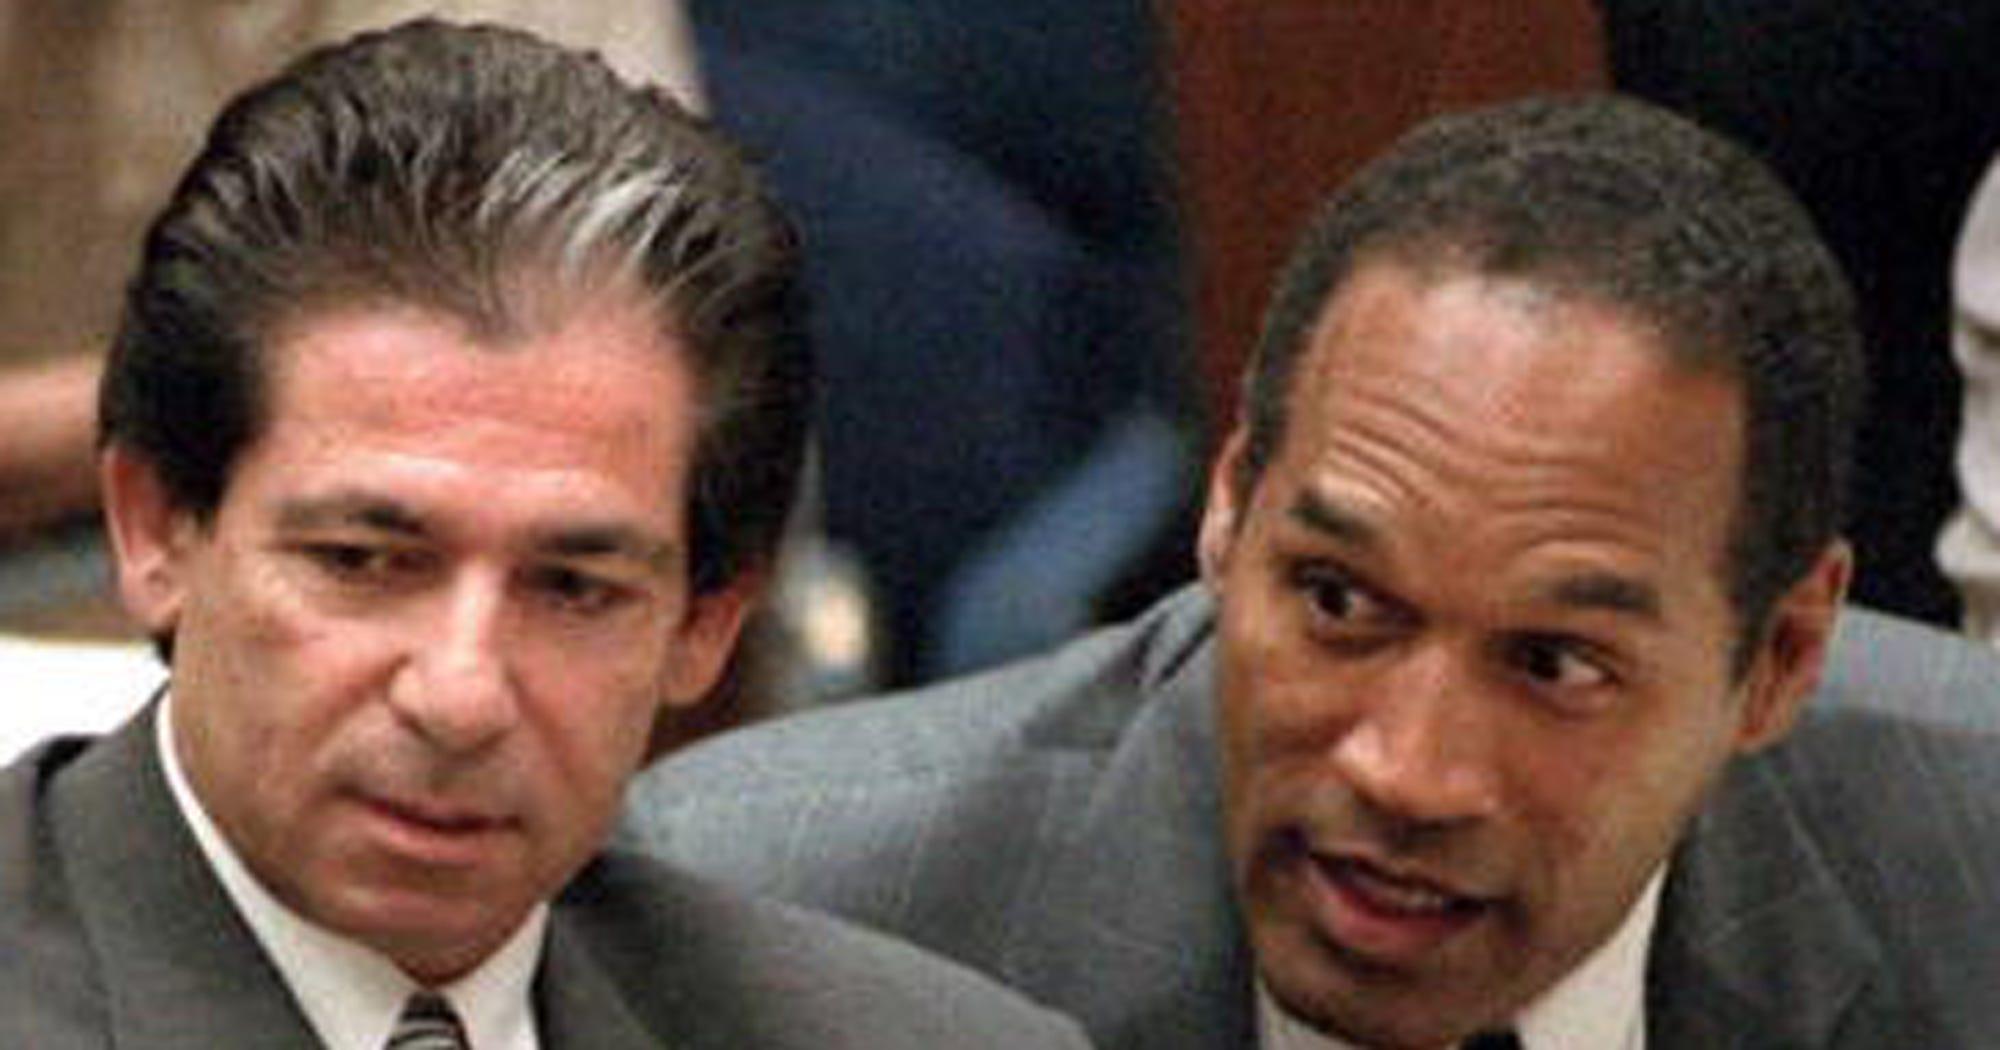 Robert Kardashian Doubts OJ Simpson Innocence Oj Simpson Not Guilty 1995